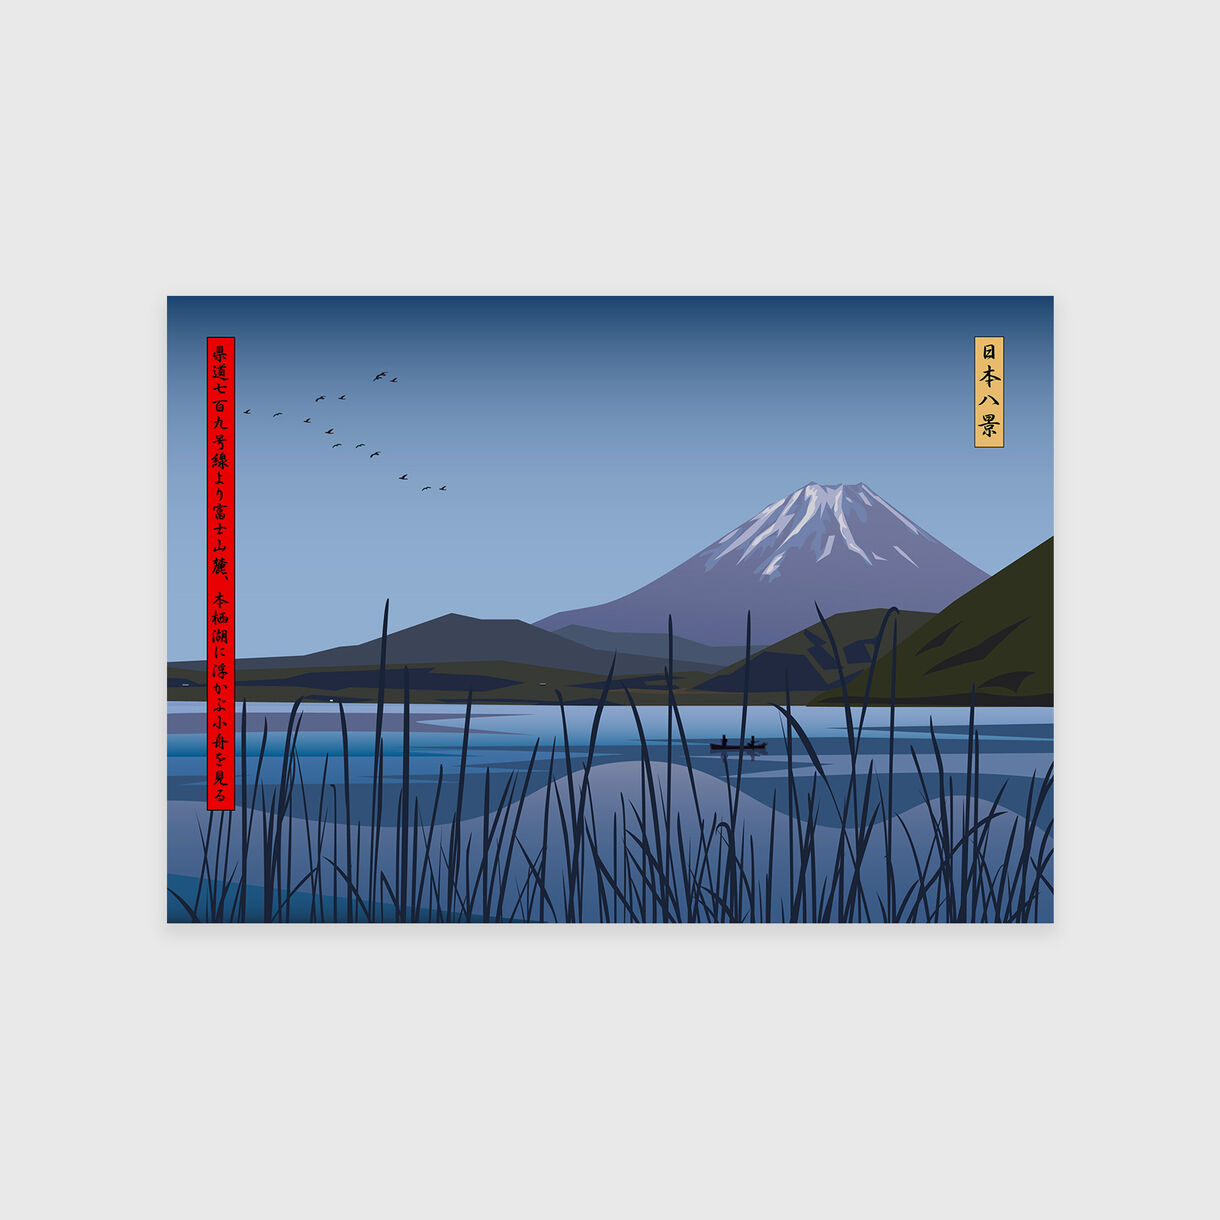 View of boats on Lake Motosu below Mount Fuji from Route 709, Julian Opie